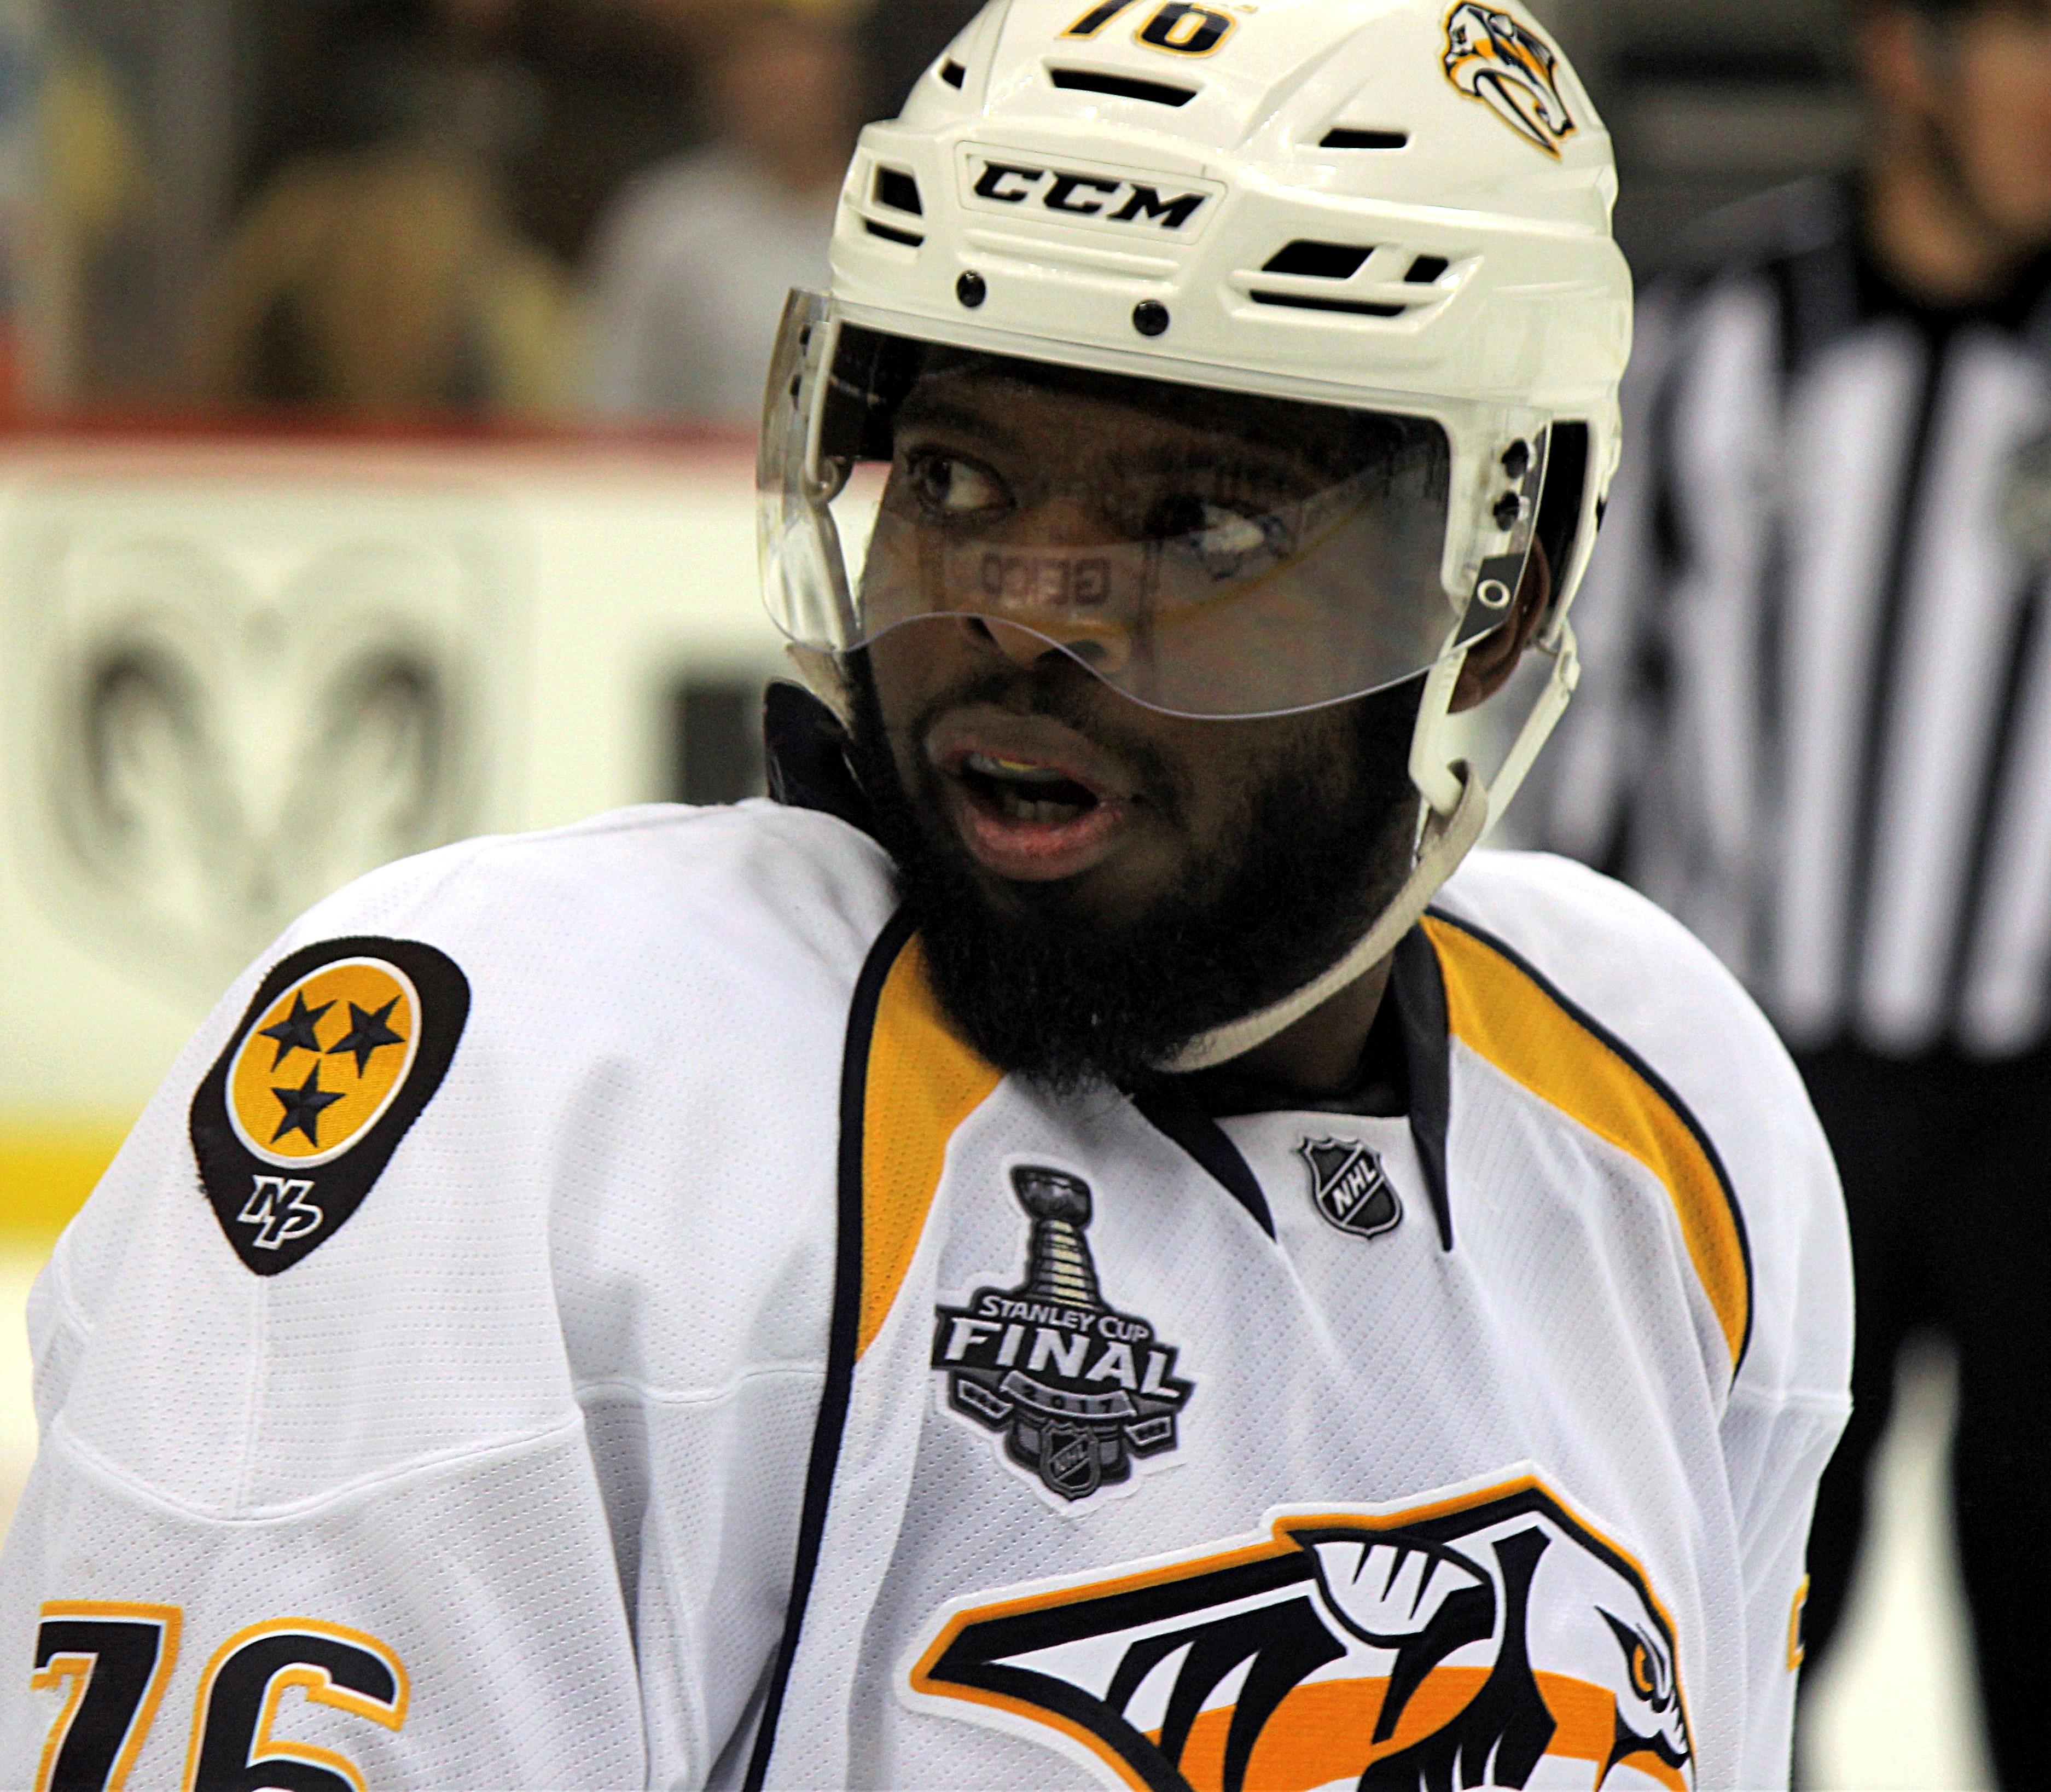 Nashville Predators Hockey Player PK Subban